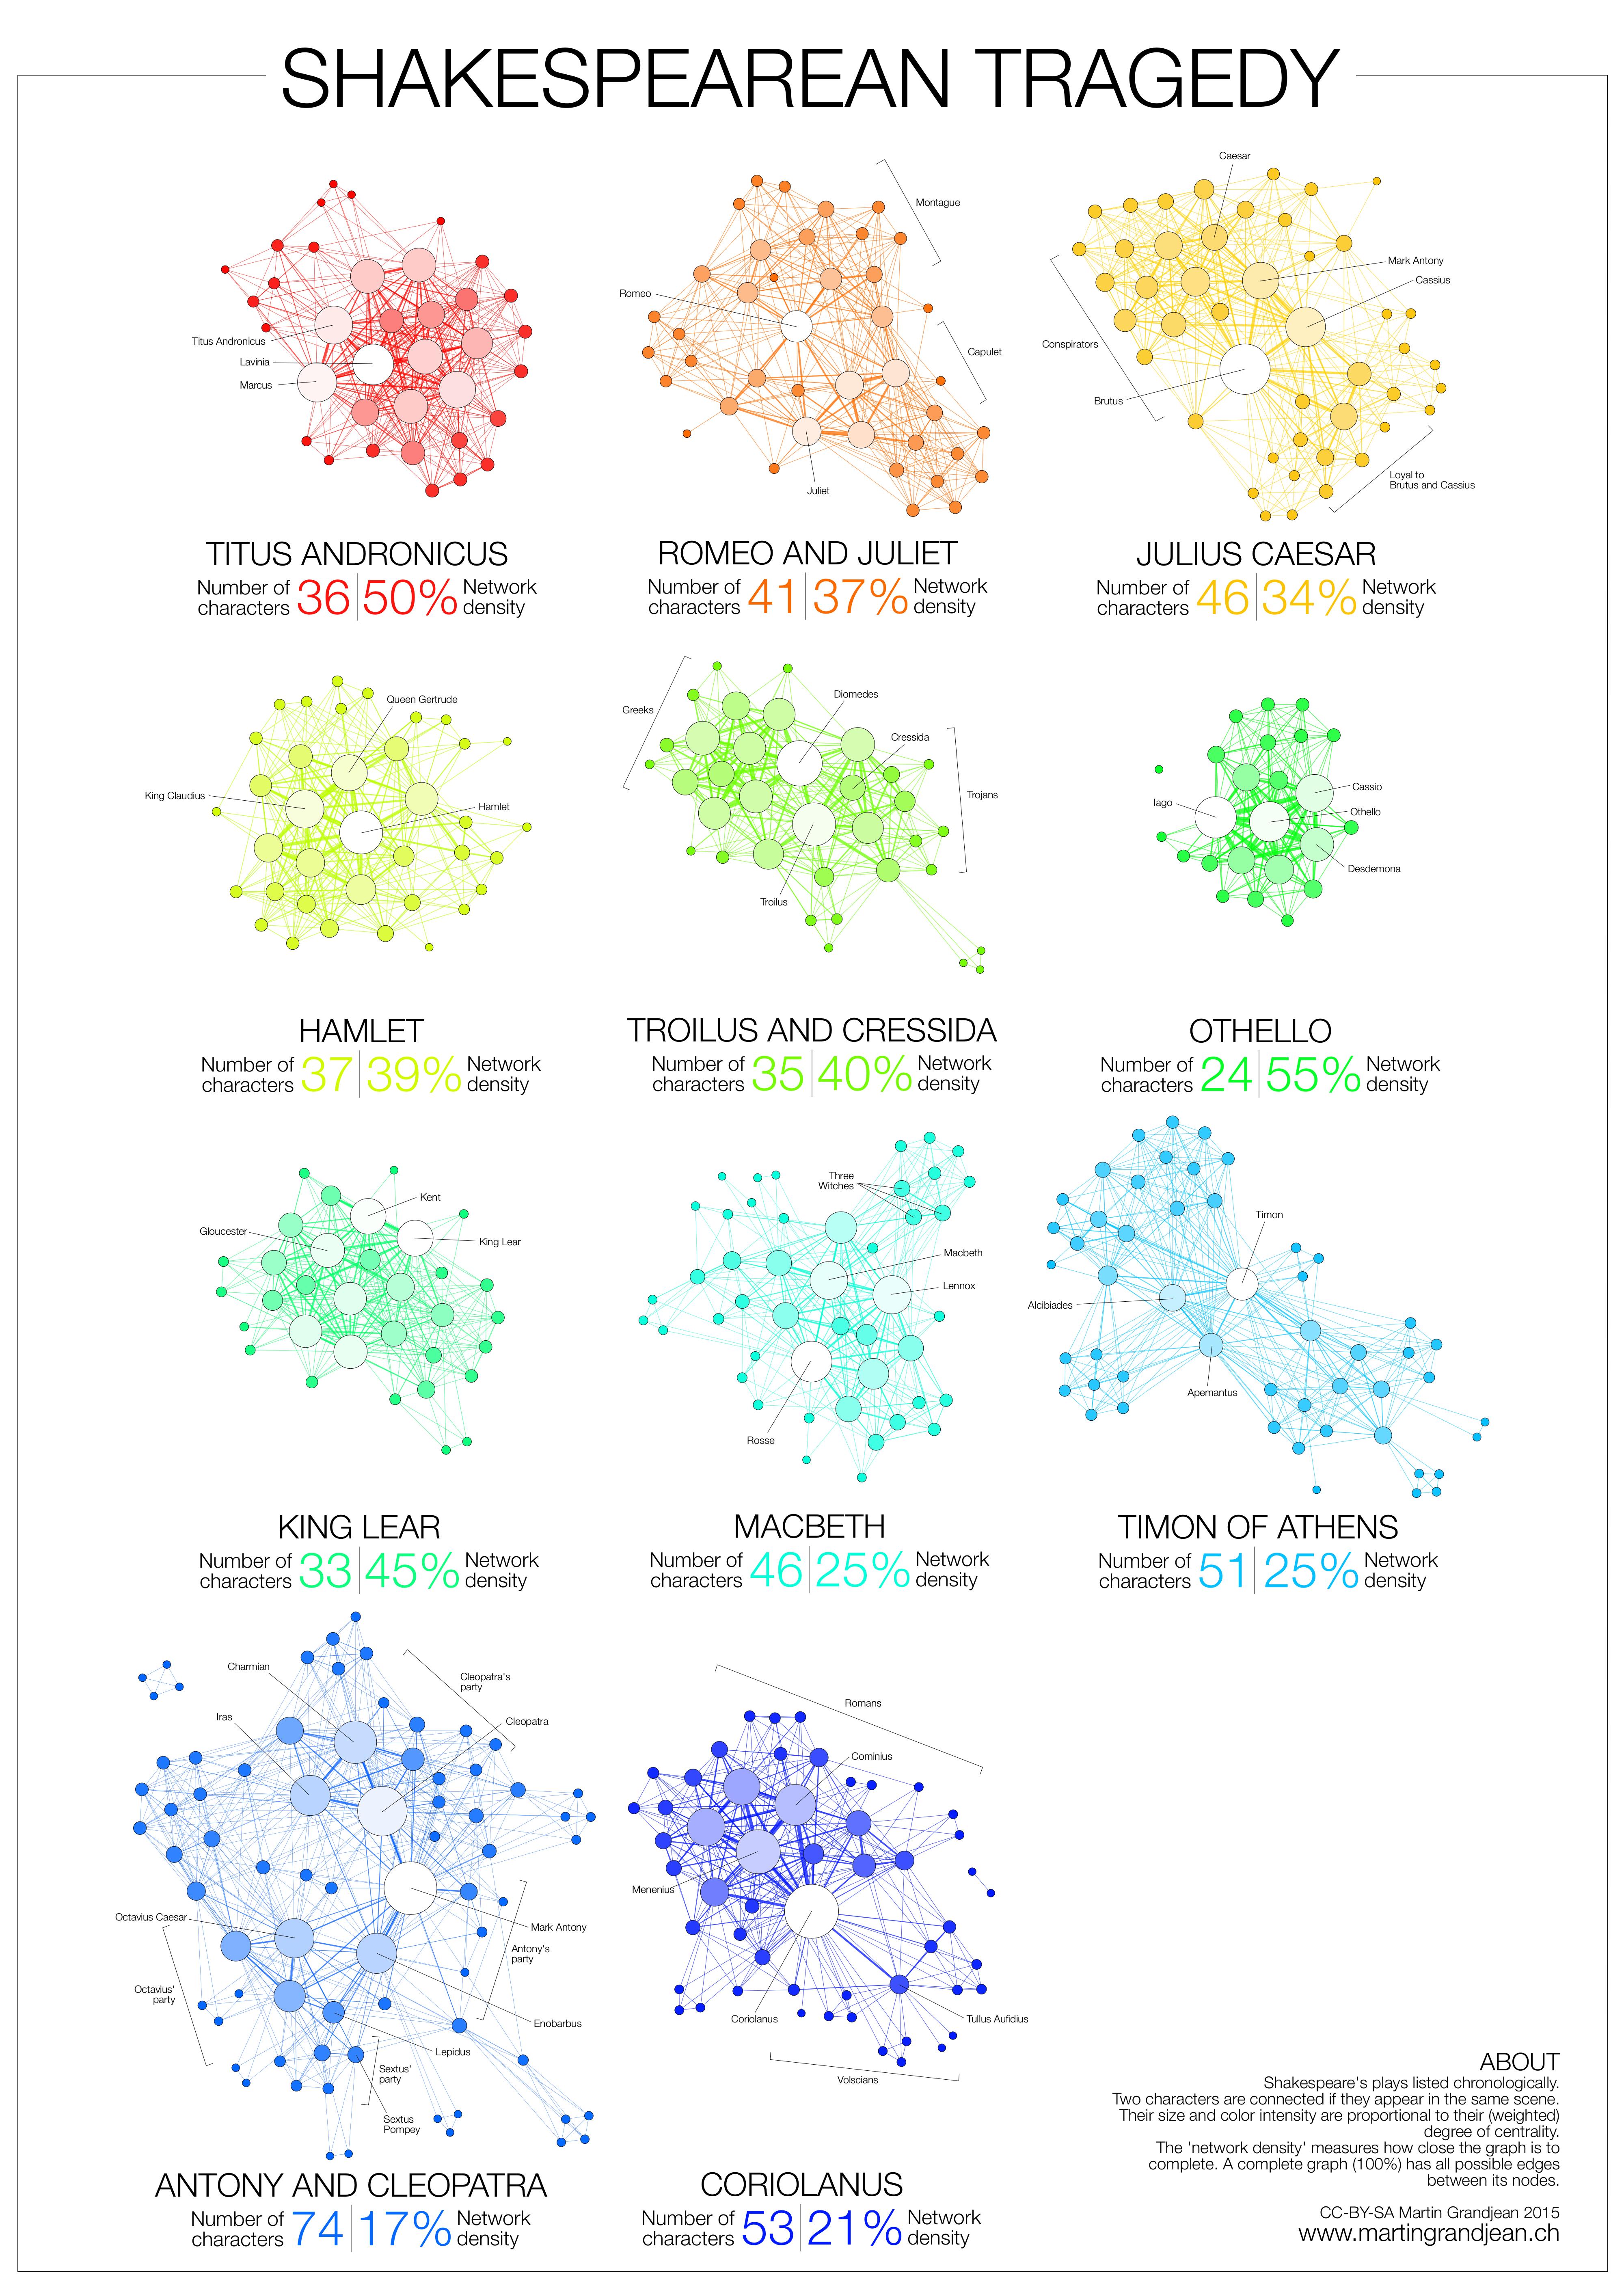 Martin grandjean digital humanities data visualization network martin grandjean digital humanities data visualization network analysis network visualization mapping shakespeares tragedies pooptronica